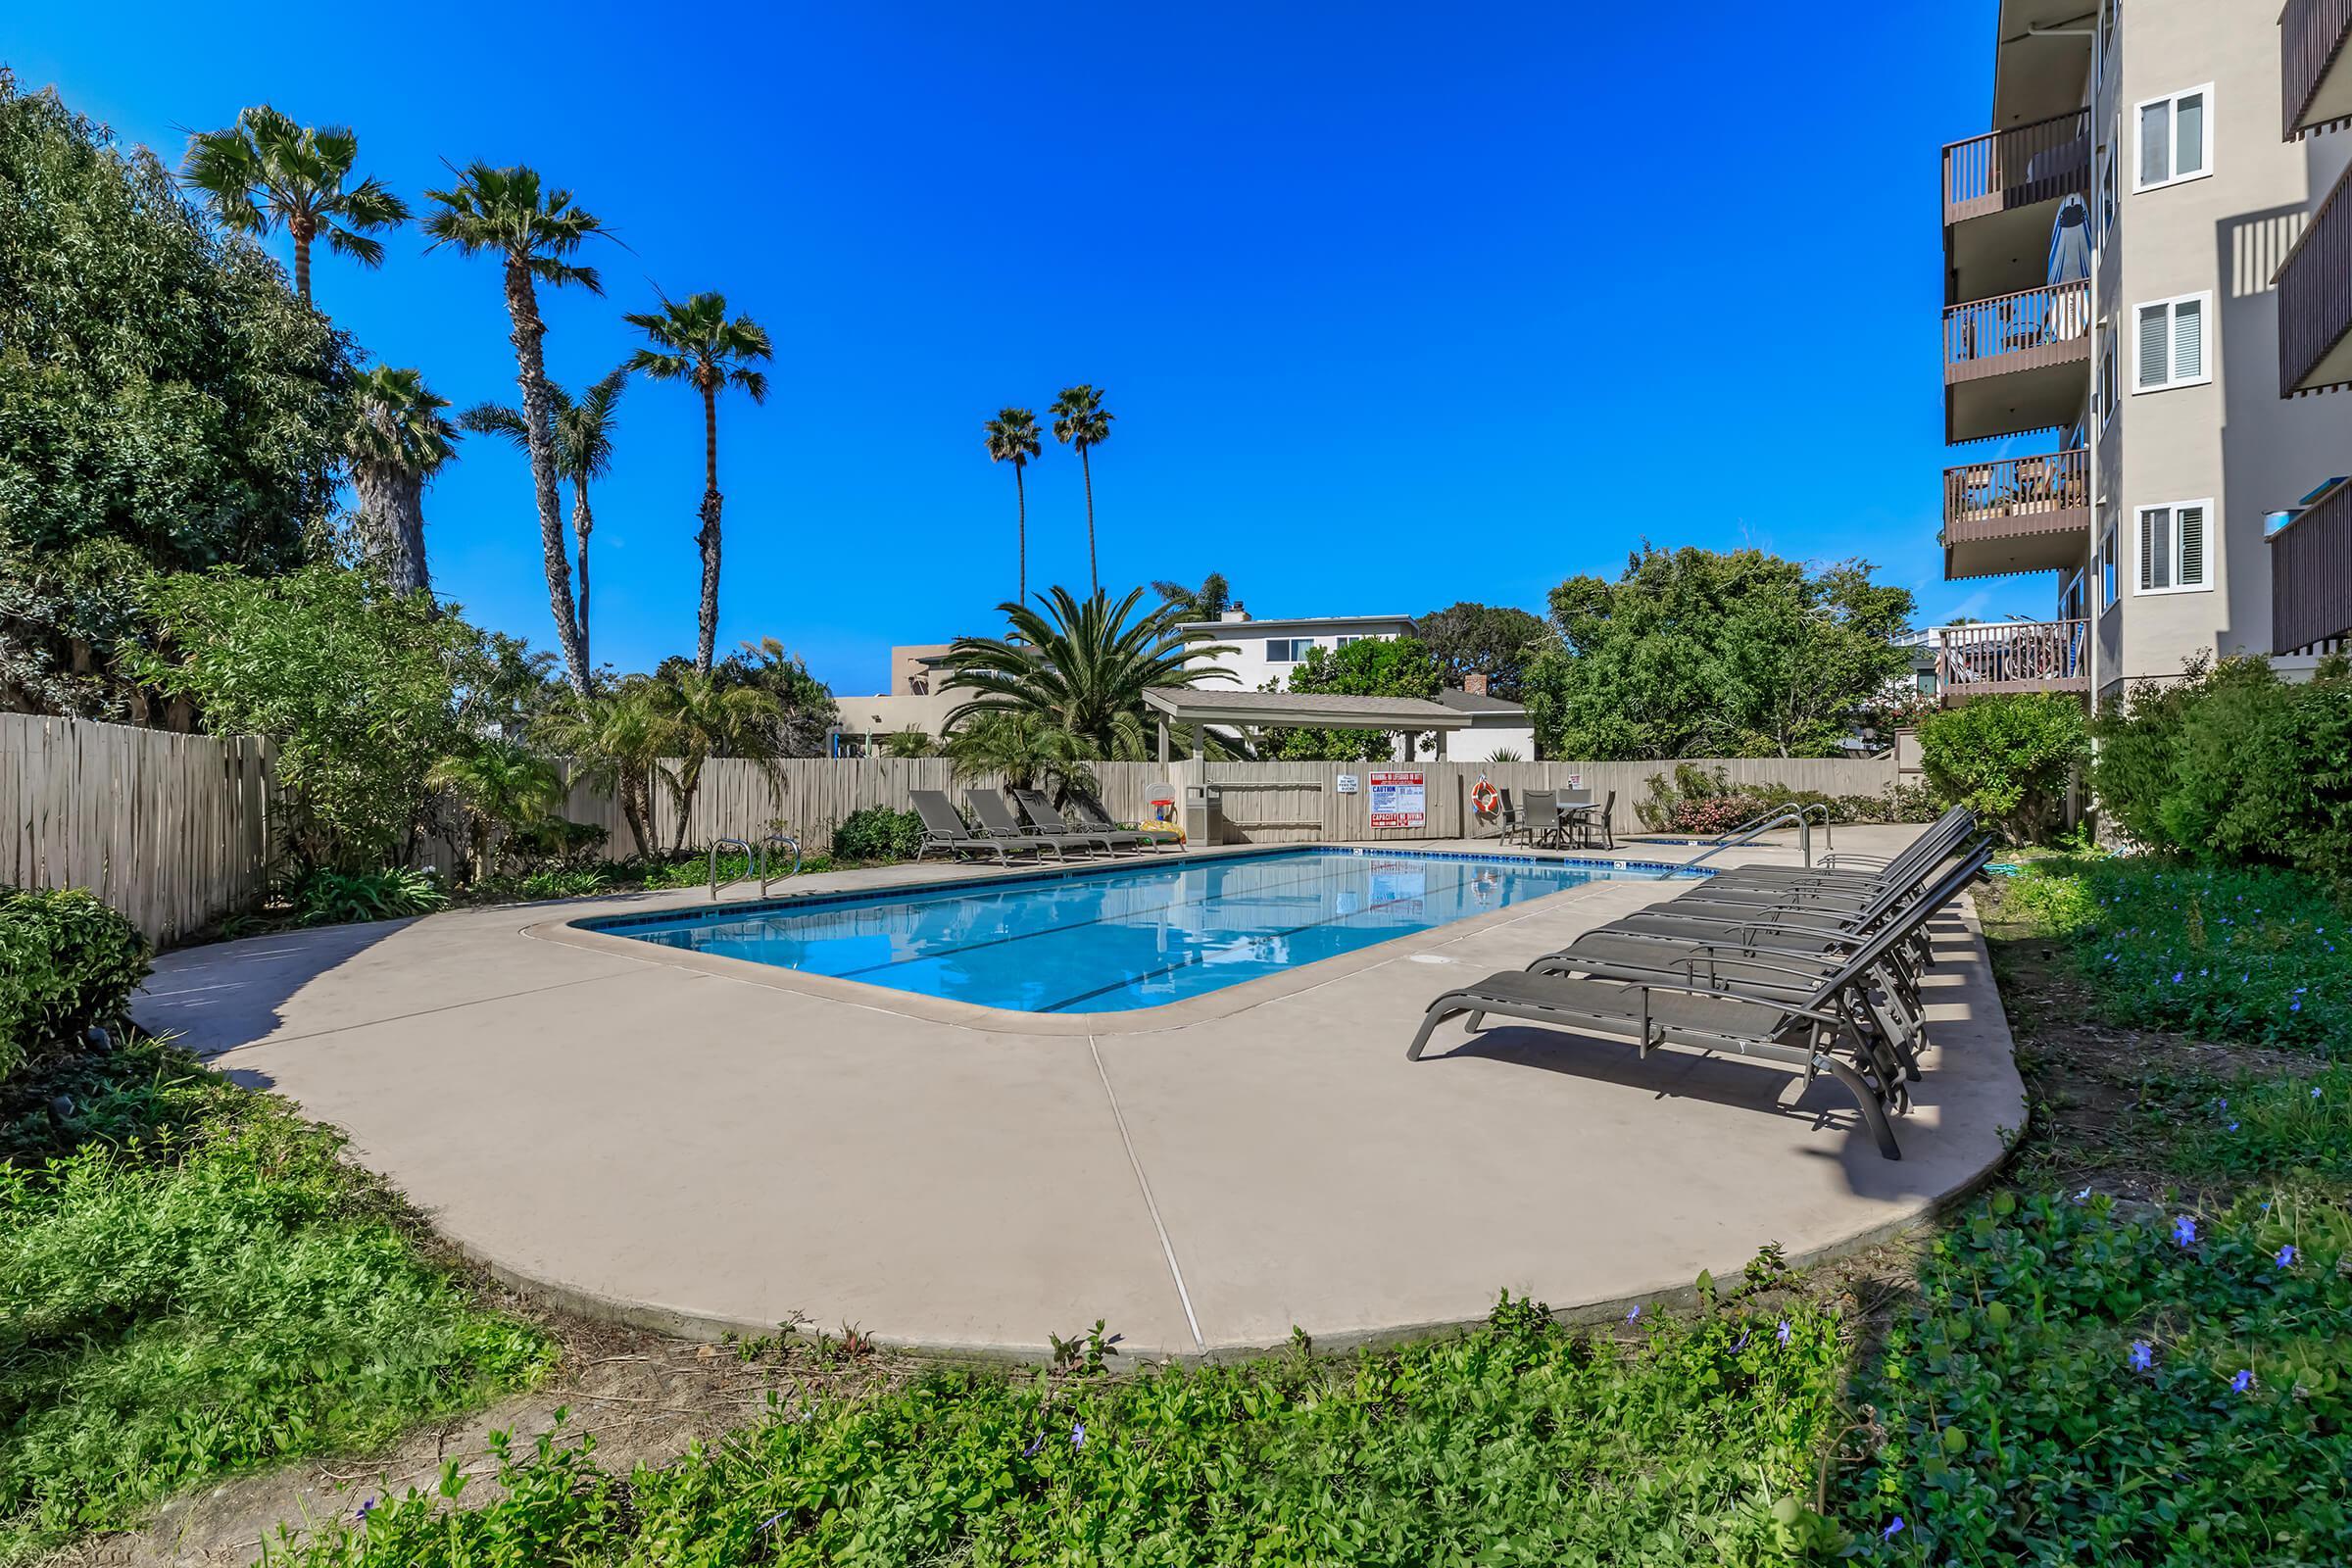 Soak up the sun at Casa Del Sur in San Diego, California